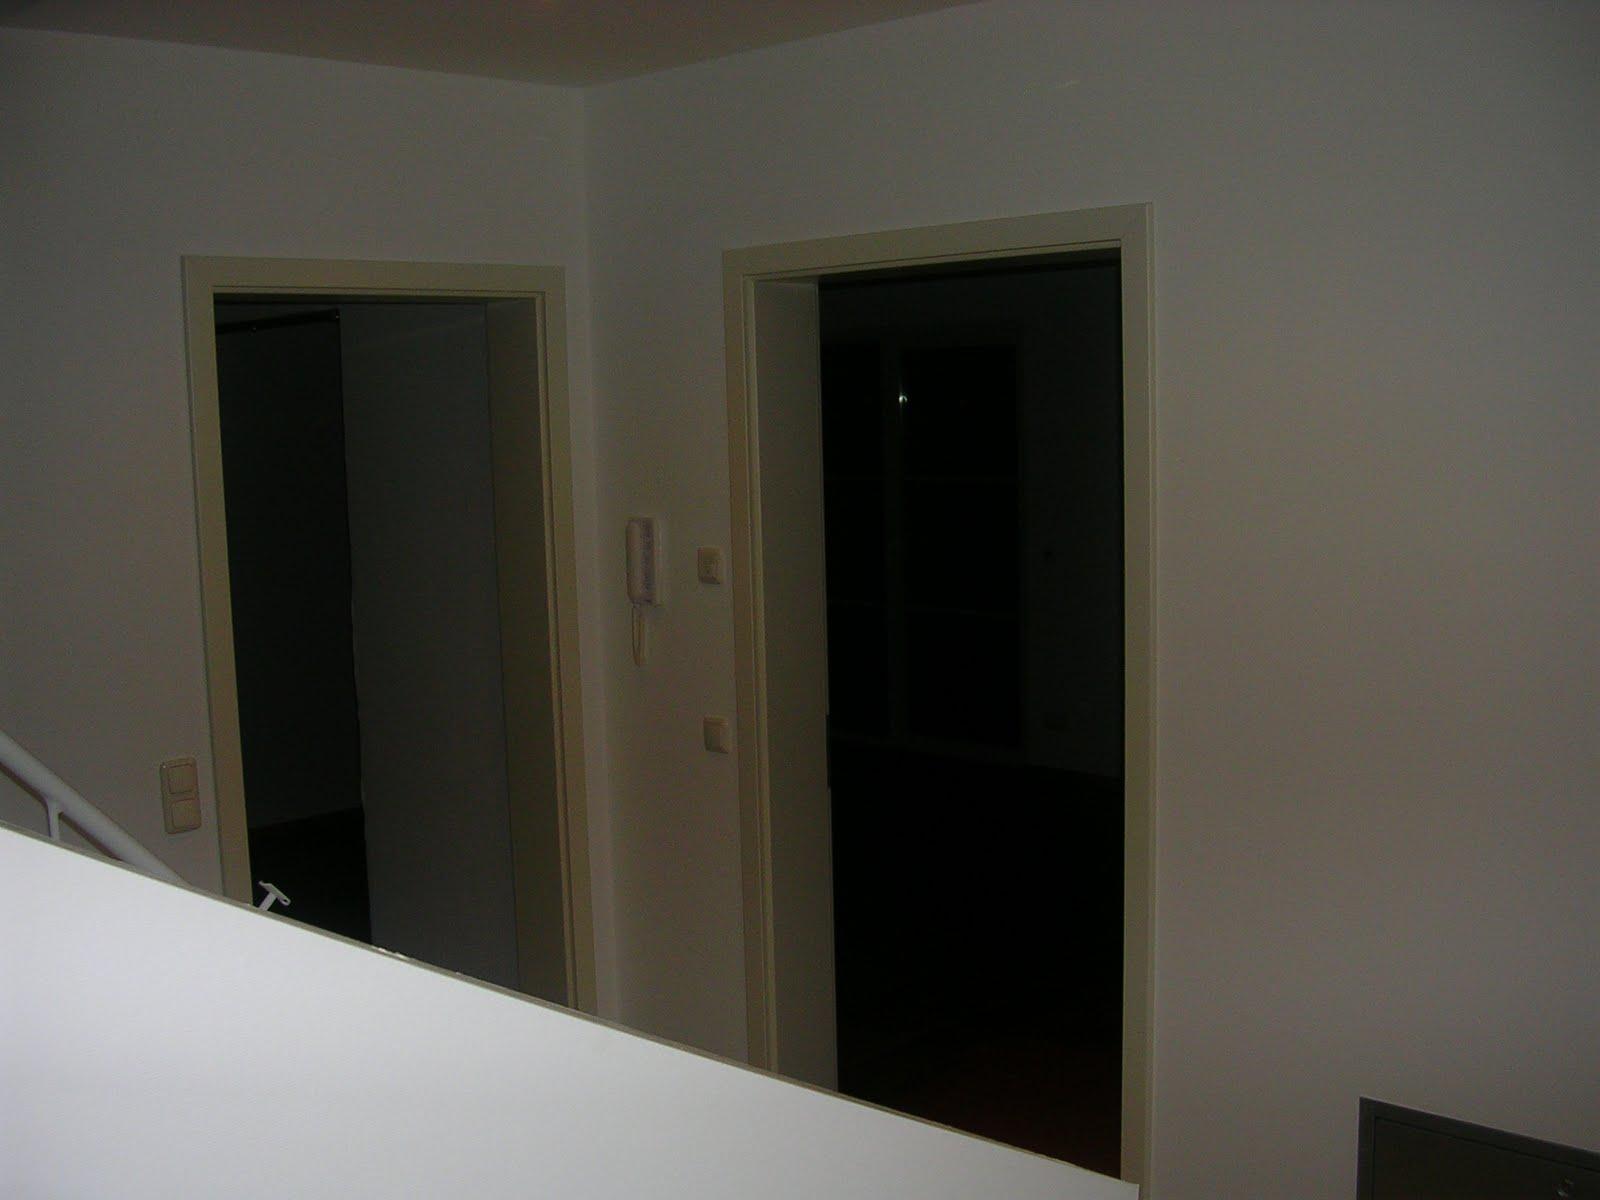 num en bau noch 4 tage bis zum umzug. Black Bedroom Furniture Sets. Home Design Ideas